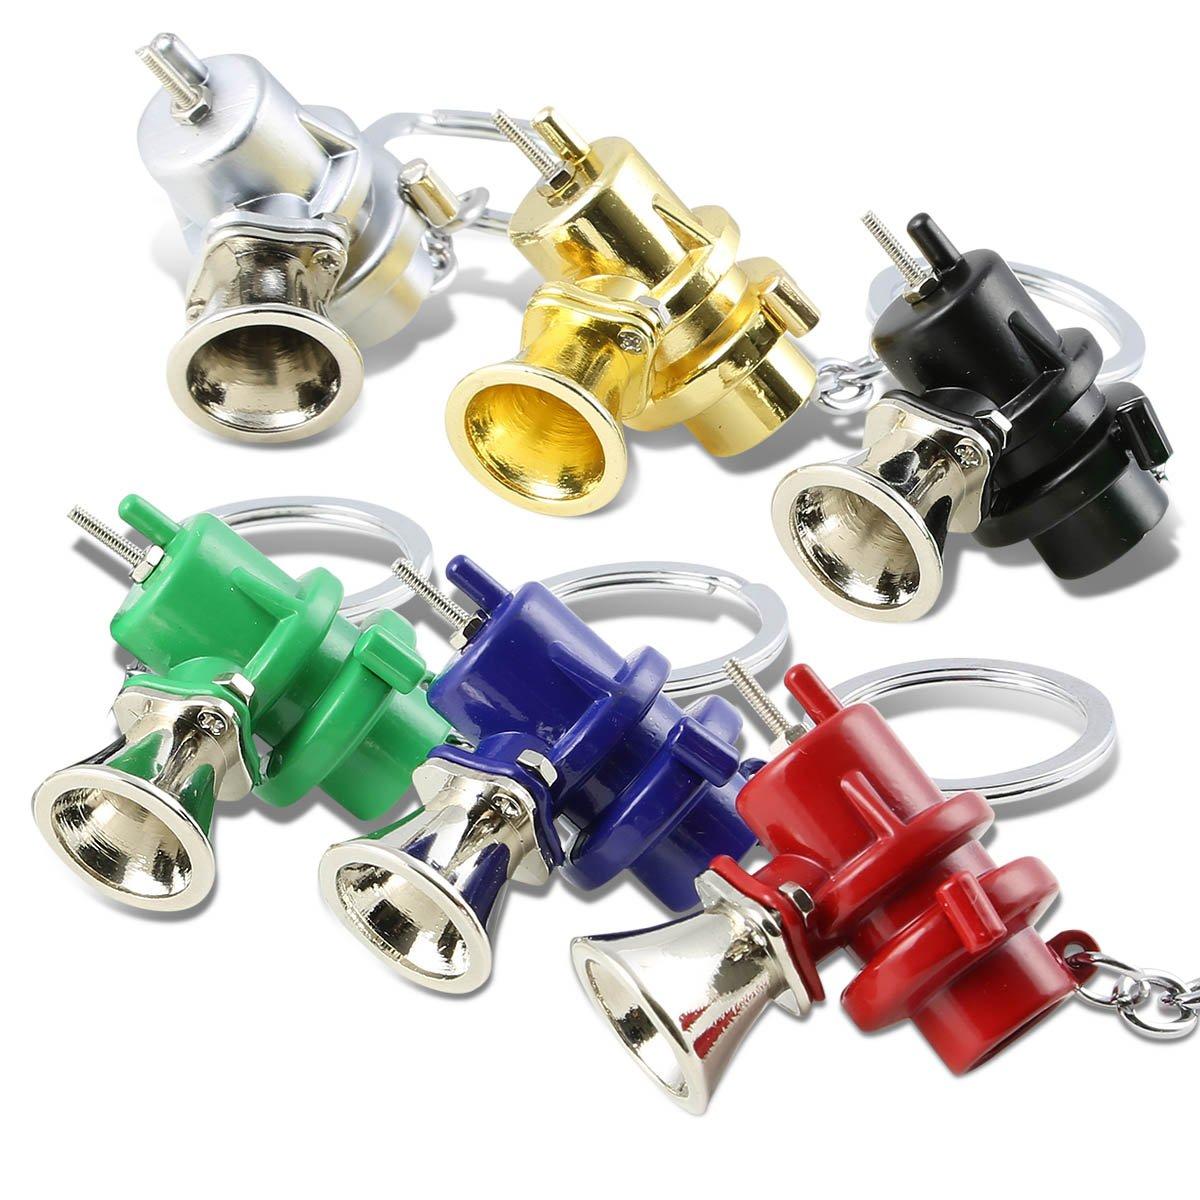 Silver DNA MOTORING KEYC-T12-SL 3D Miniature Spark Plug Style Metal Keychain